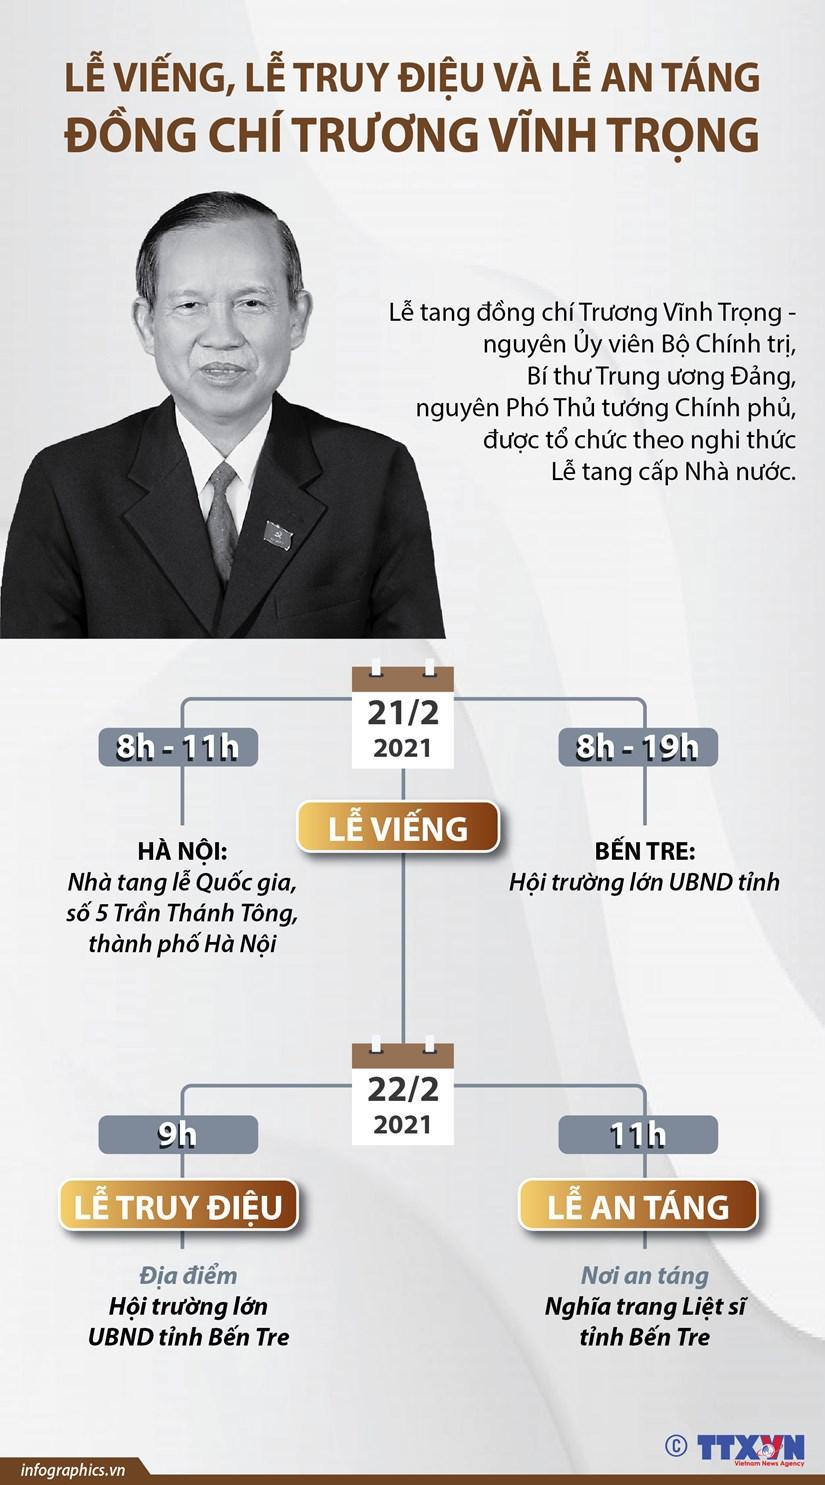 Le vieng, le truy dieu va le an tang nguyen PTT Truong Vinh Trong hinh anh 1